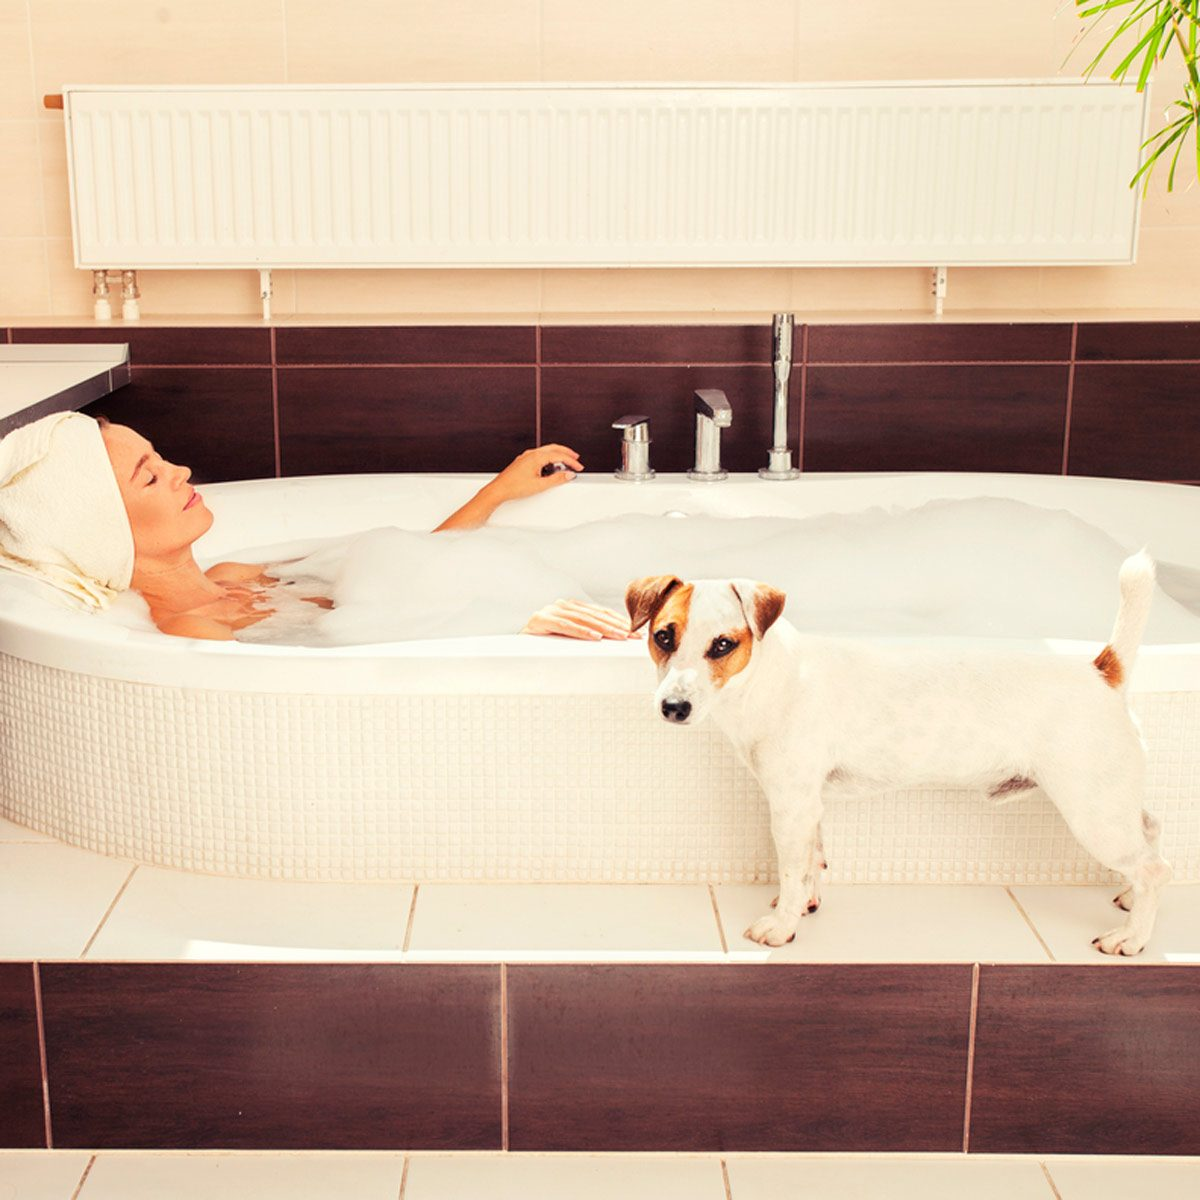 Why Does My Dog Follow Me Into The Bathroom The Family Handyman